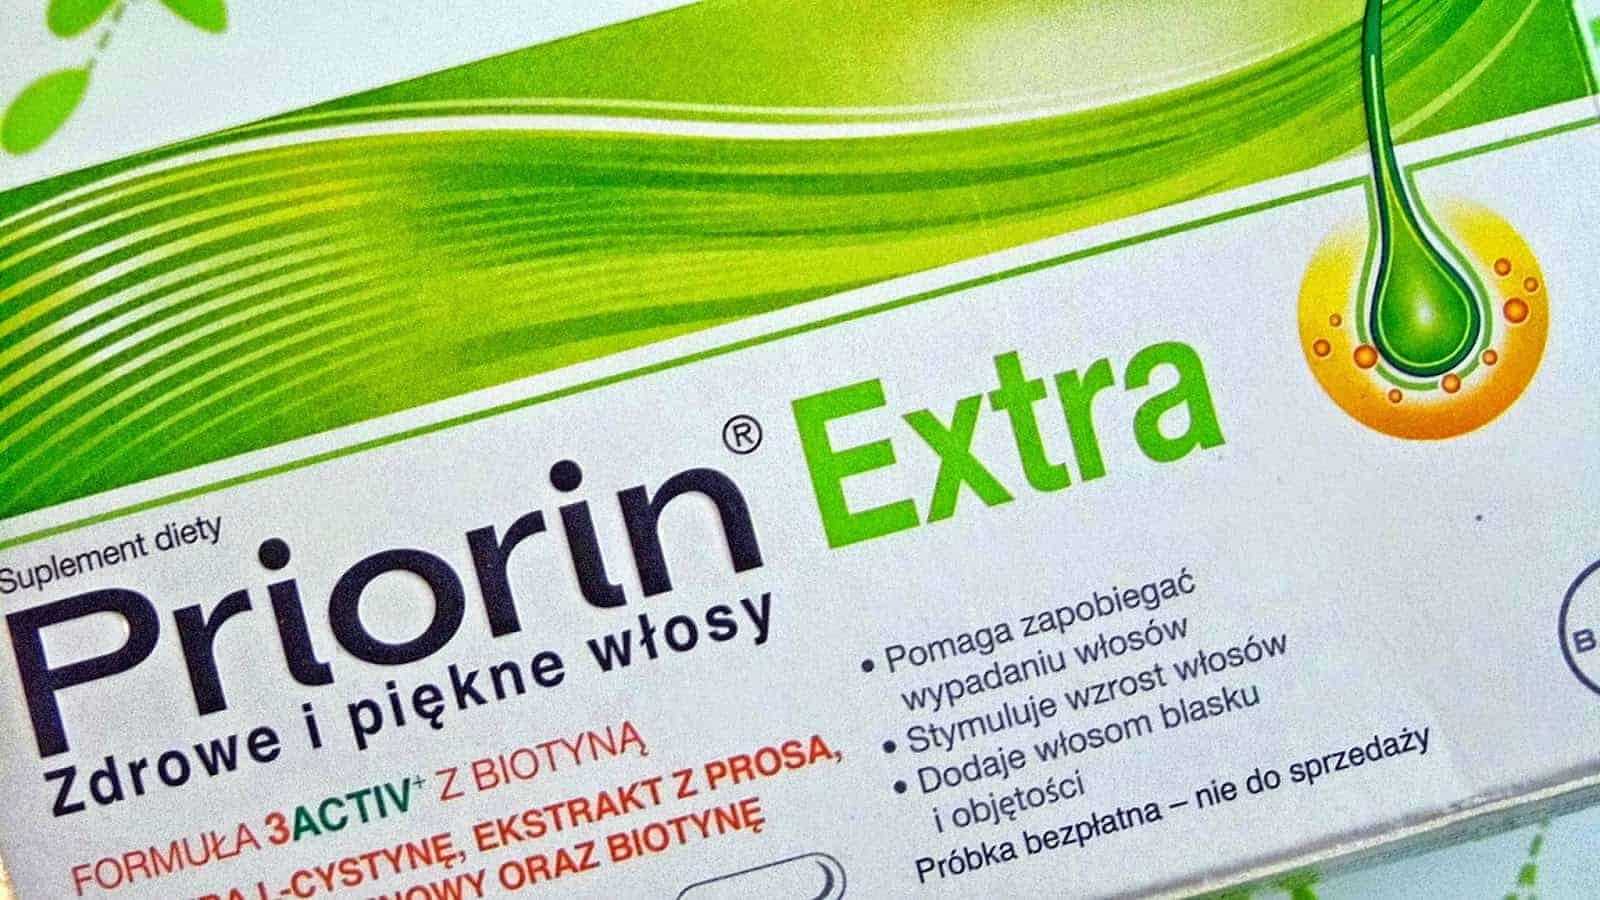 priorin extra